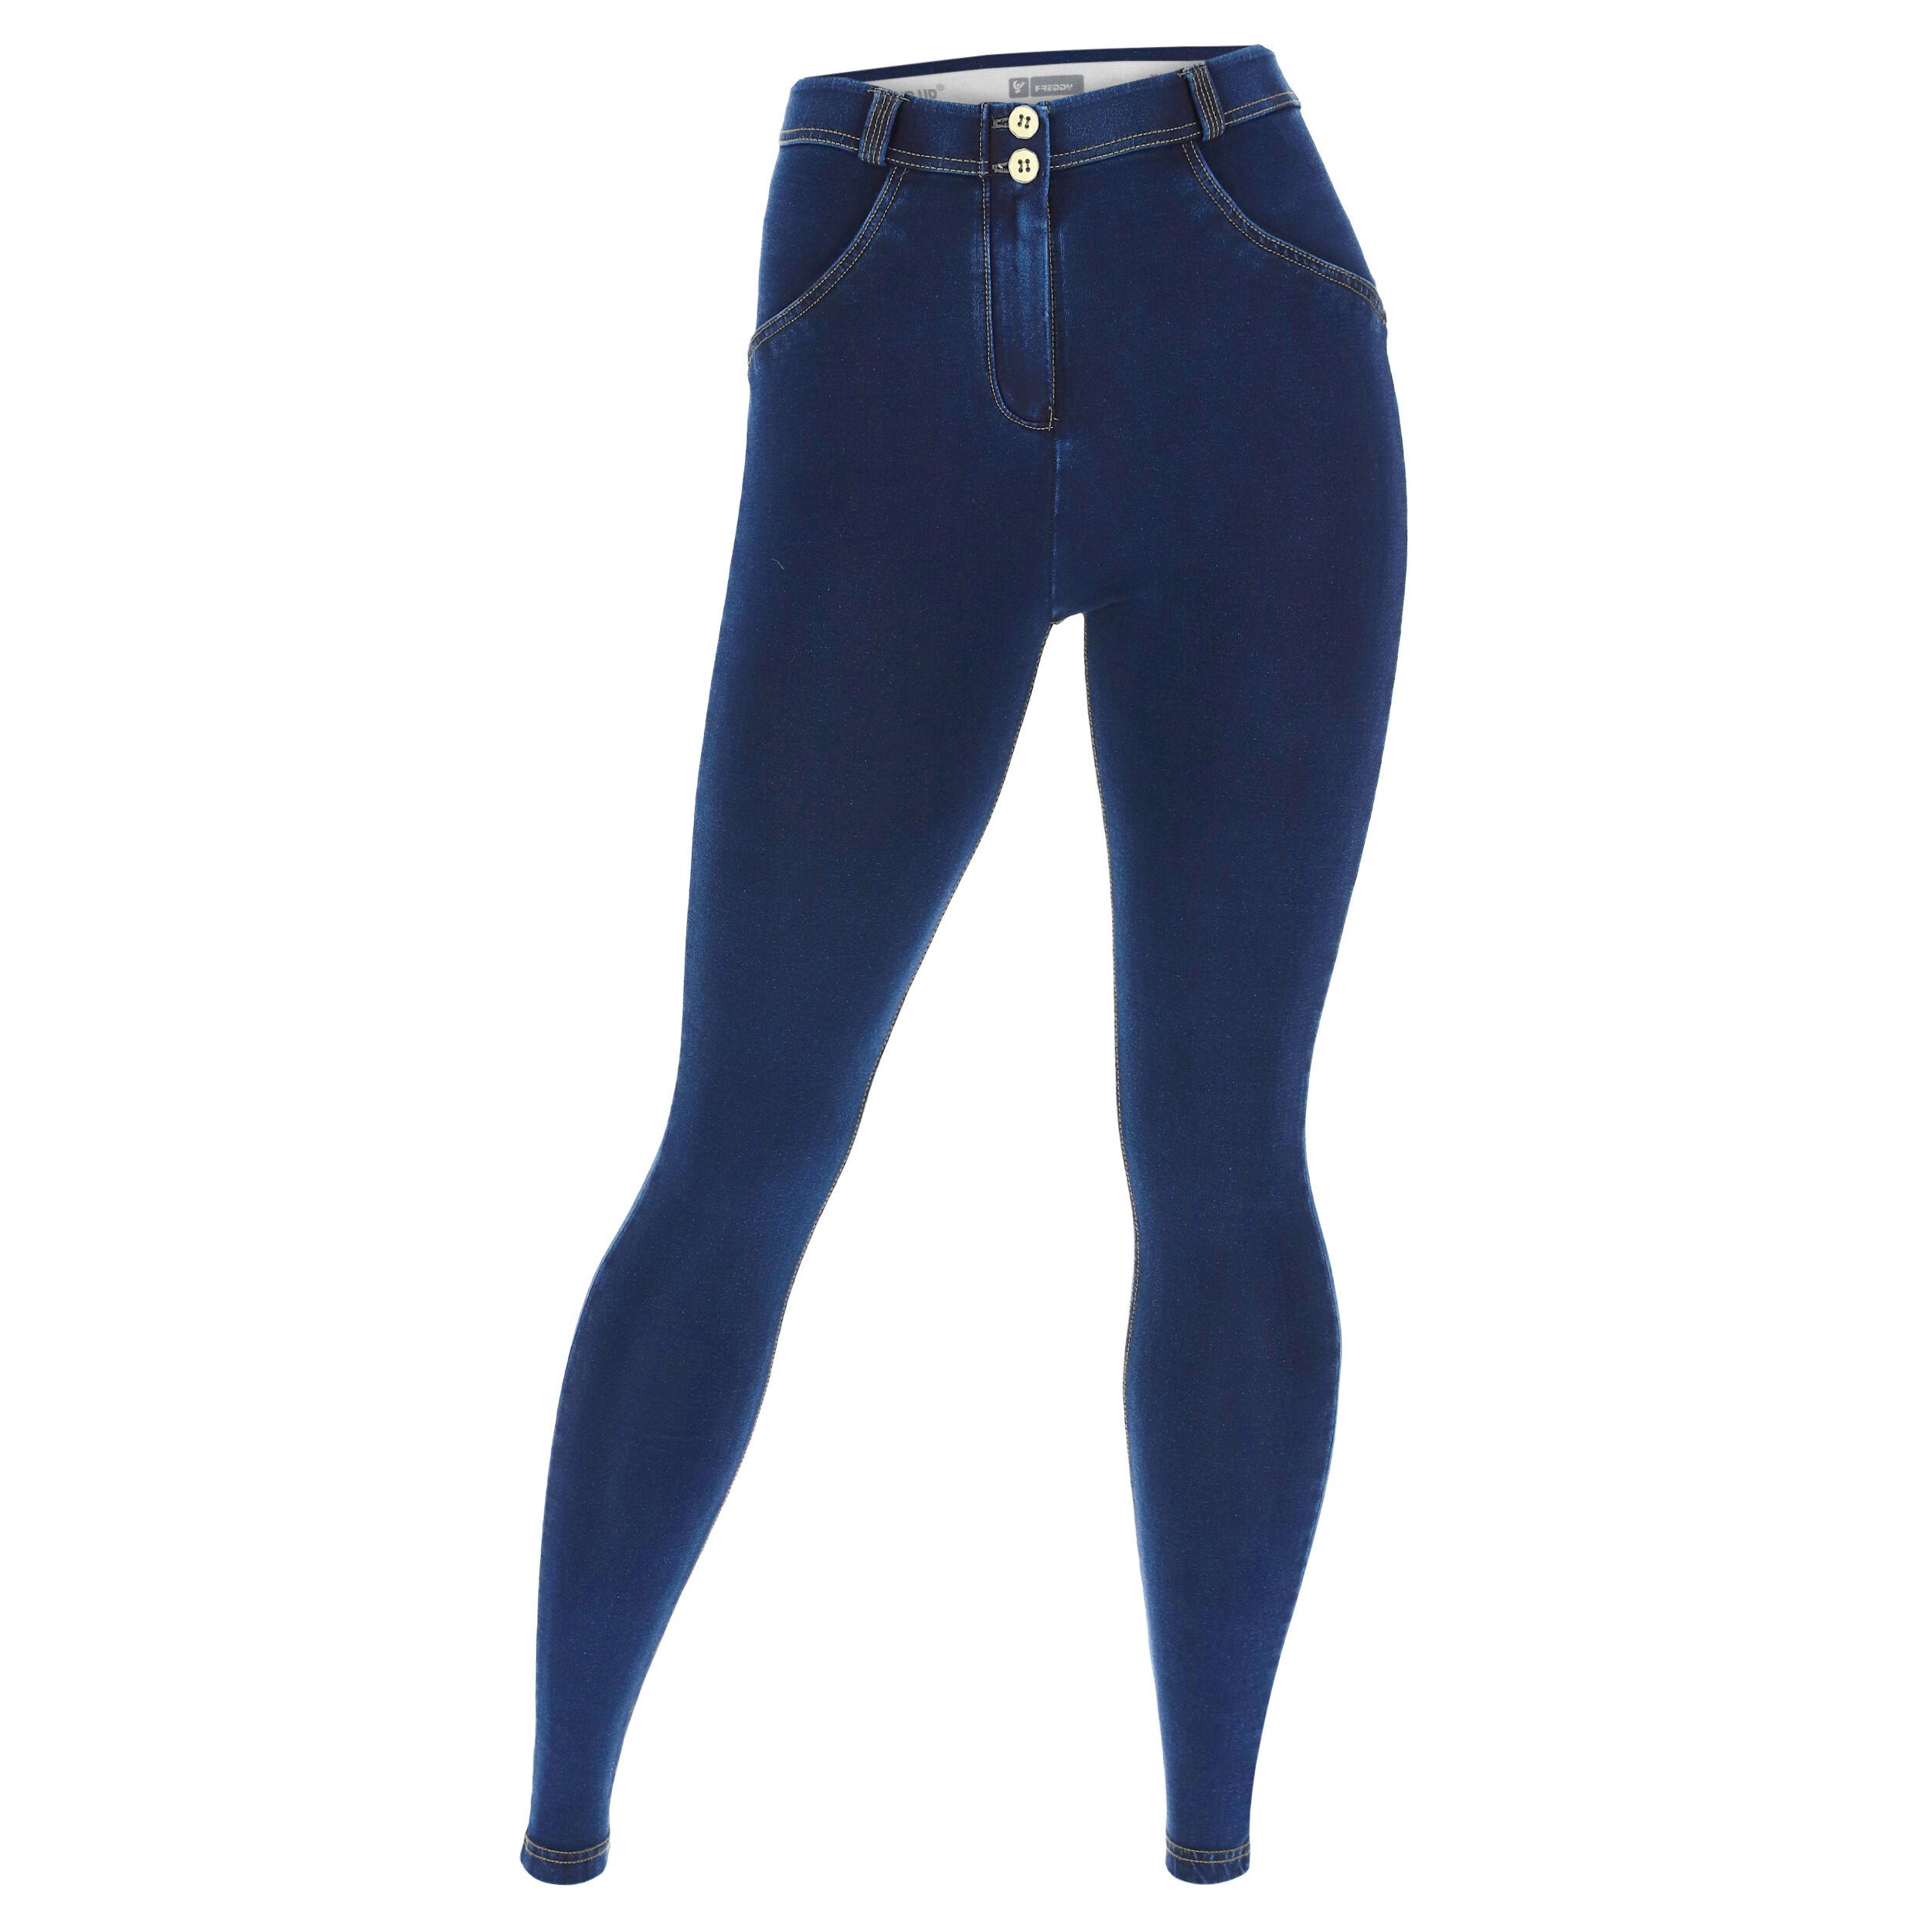 Freddy Jeggins push up WR.UP® vestibilità curvy denim scuro Jeans Scuro-Cuciture In Tono